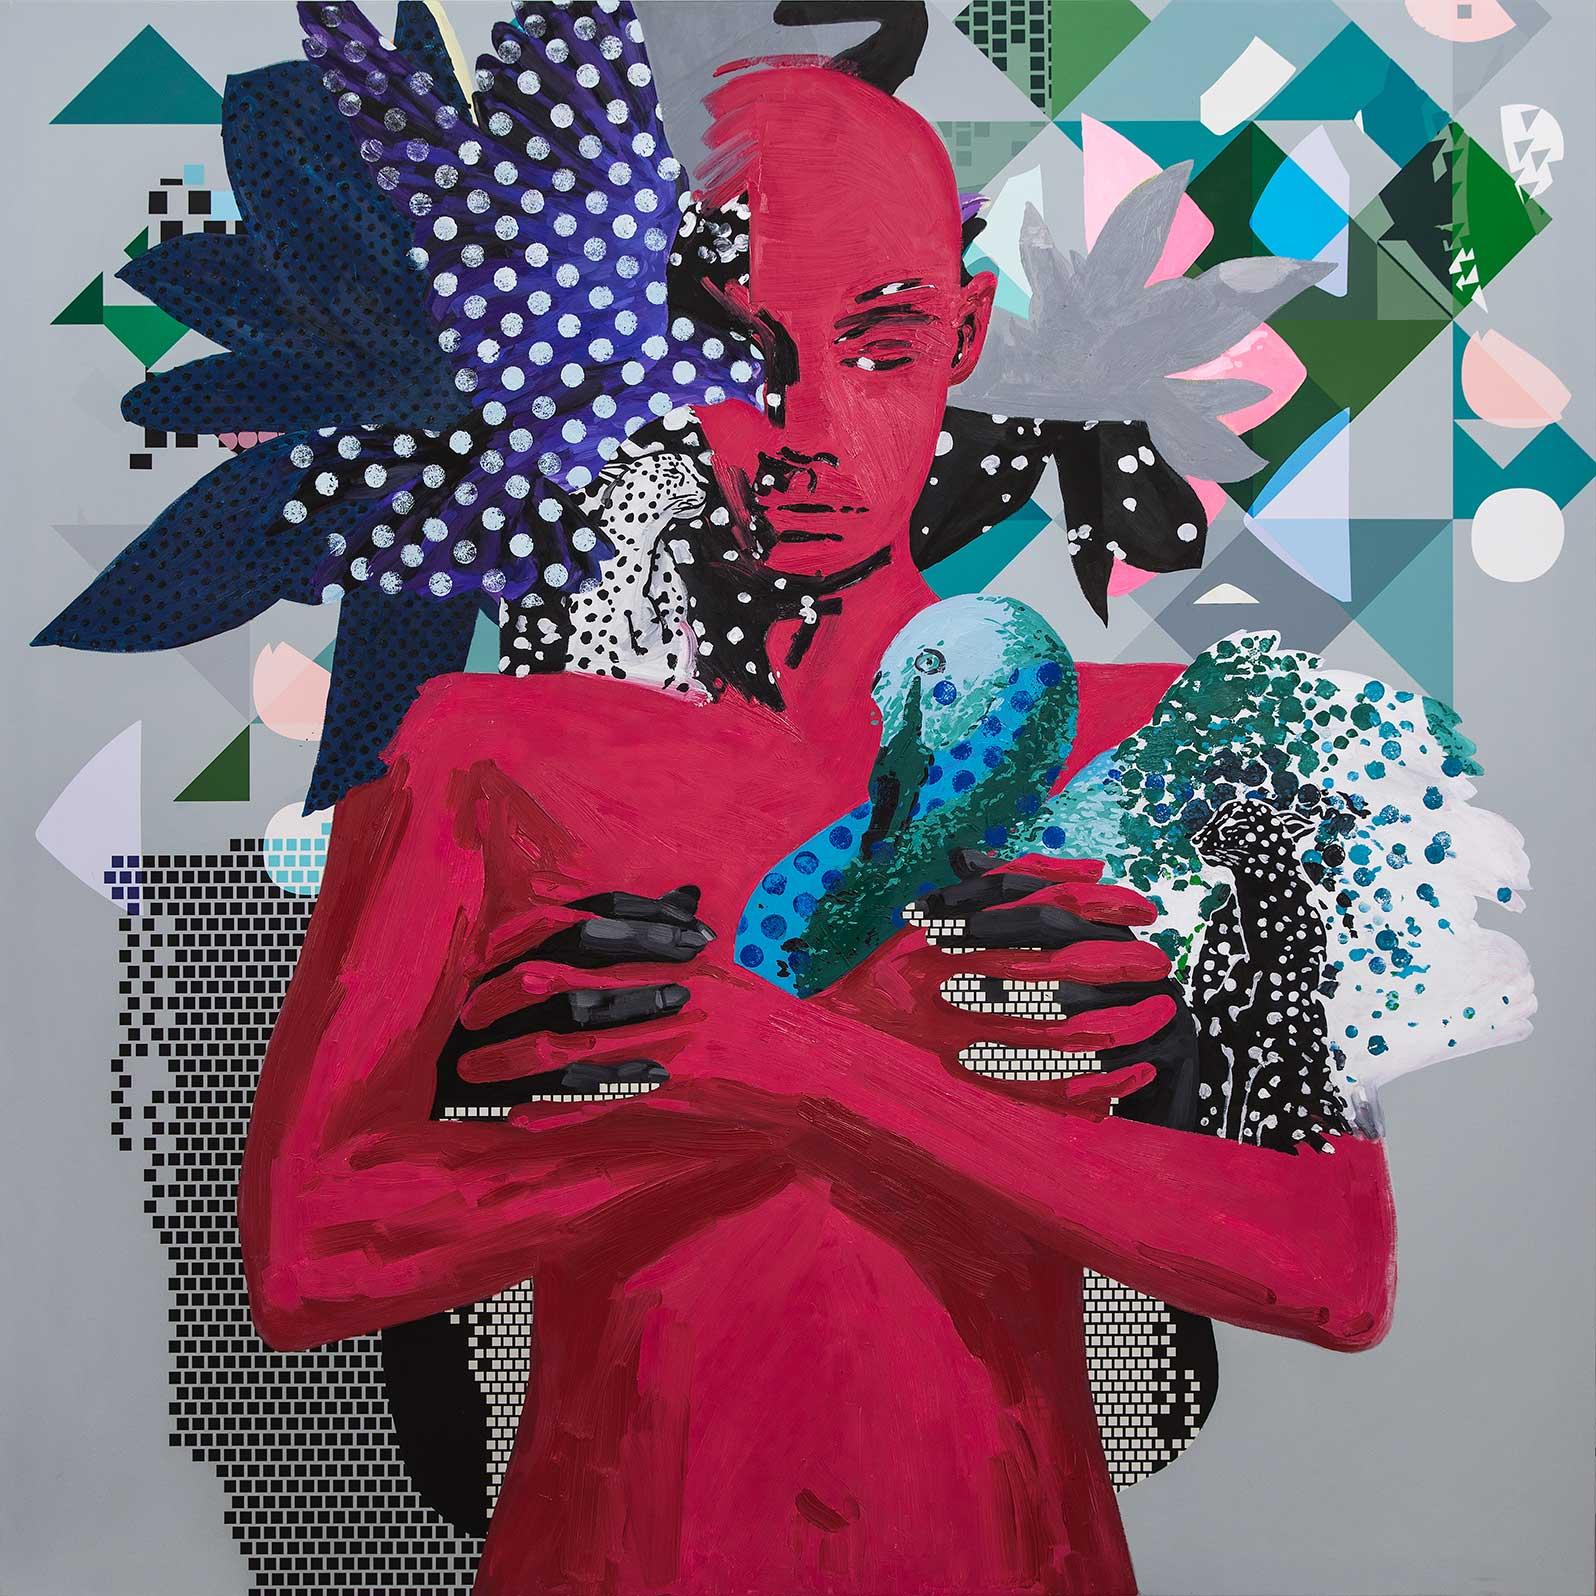 Anca Stefanescu | Mixed Media | Messengers, Modern Art Paintings